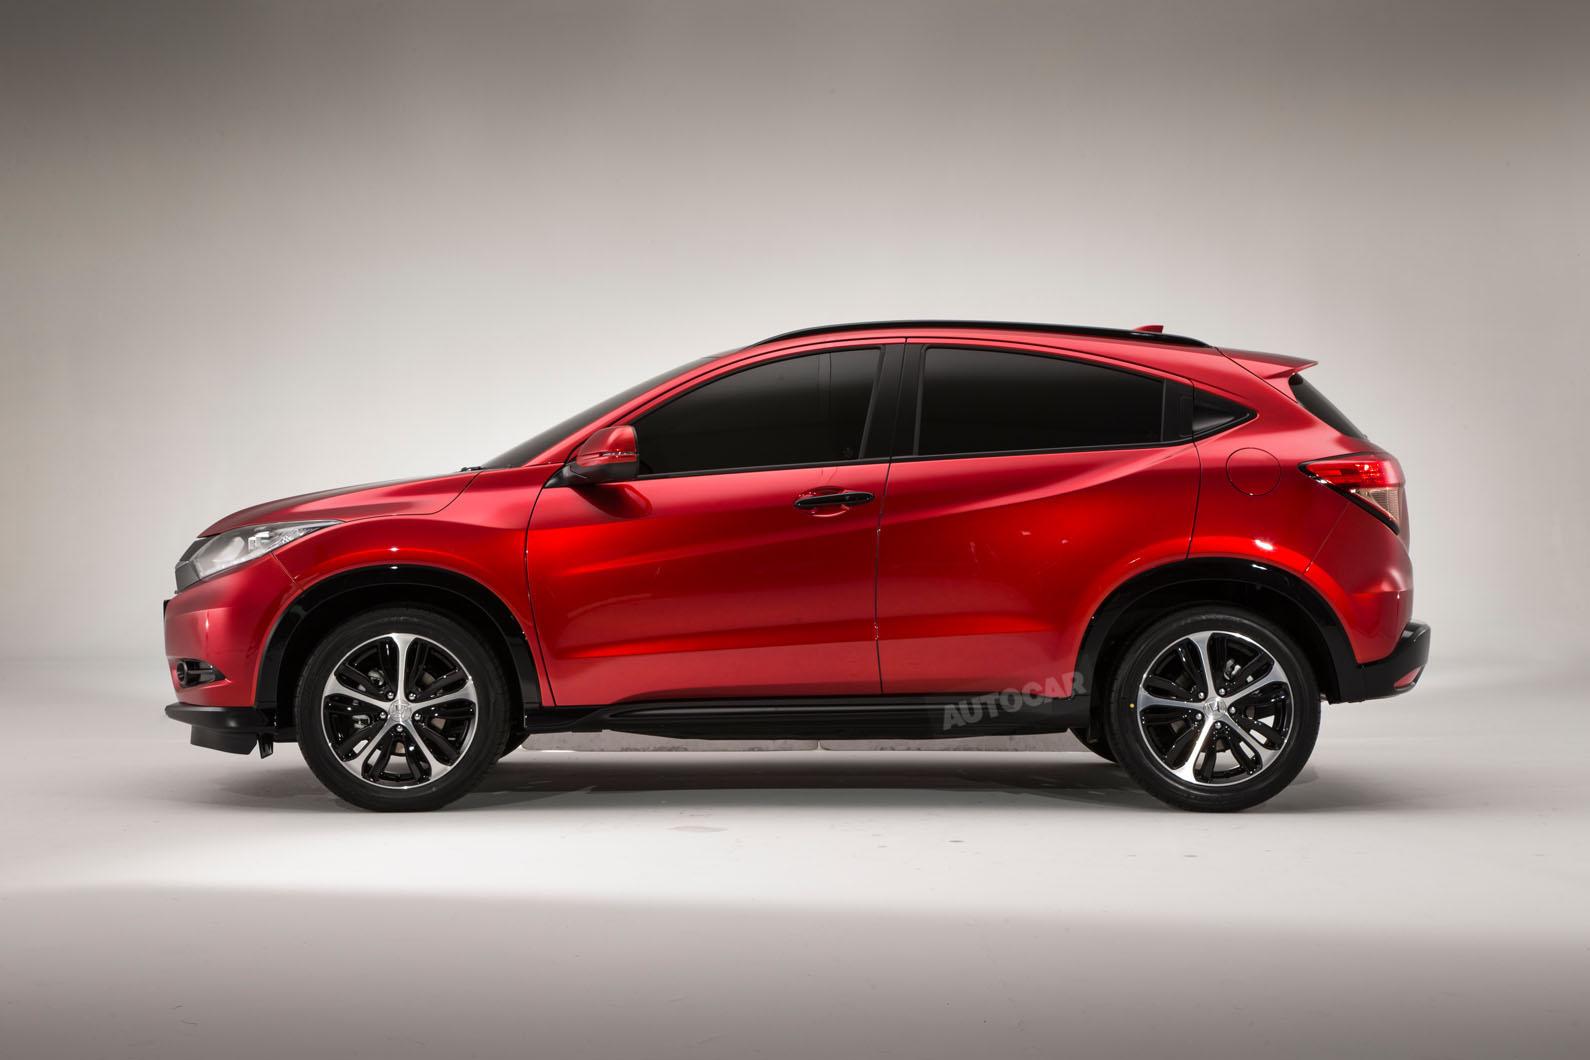 2014 - [Honda] Vezel / HR-V - Page 4 Honda-dj4u-hr-v-2014-studio-4d-023